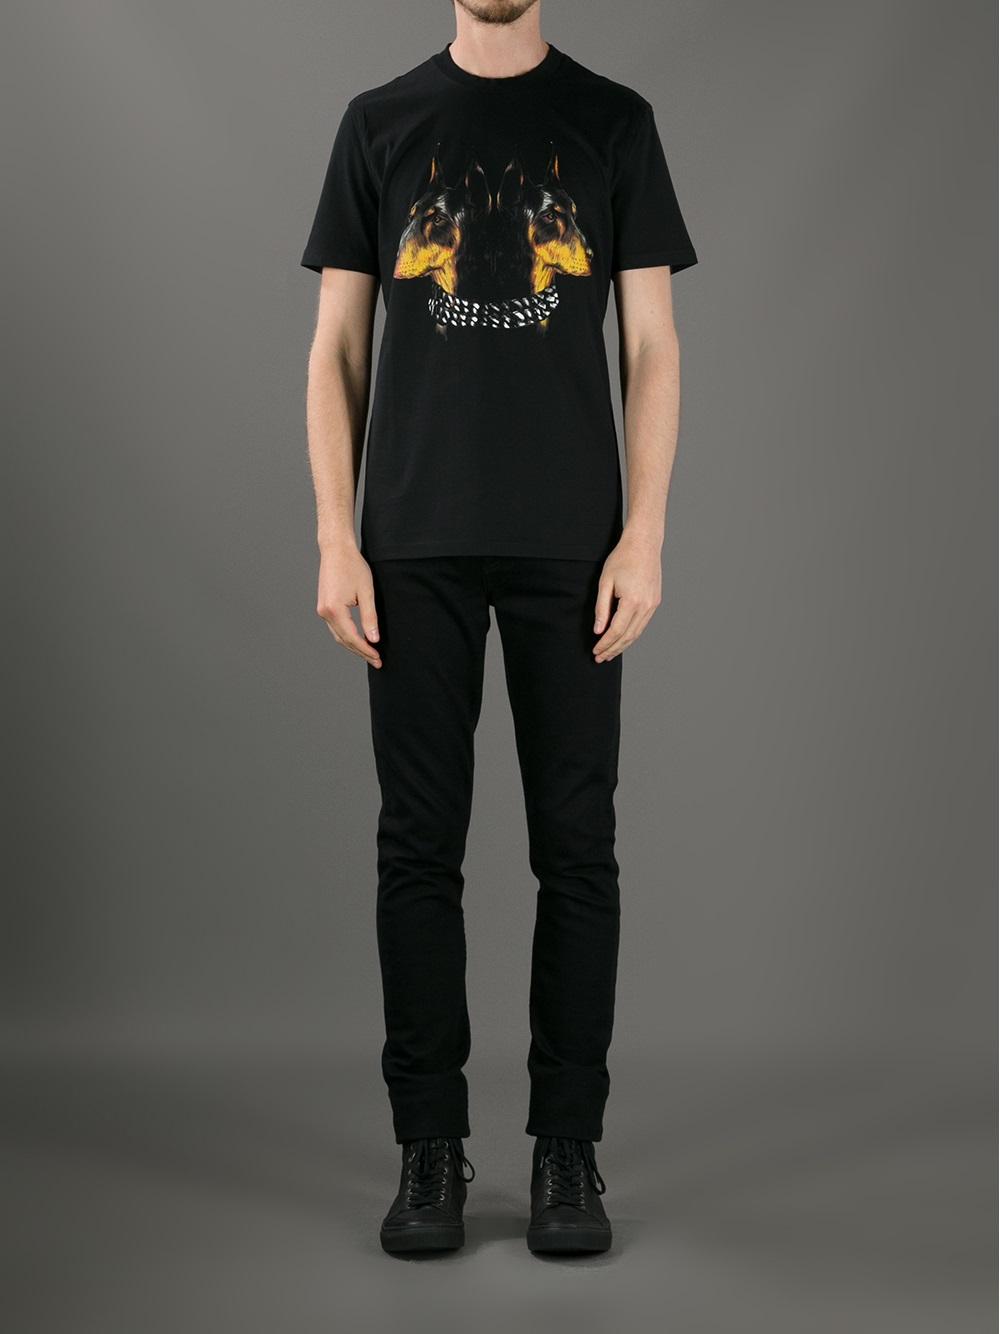 825908b84a Givenchy Doberman Print Tshirt in Black for Men - Lyst